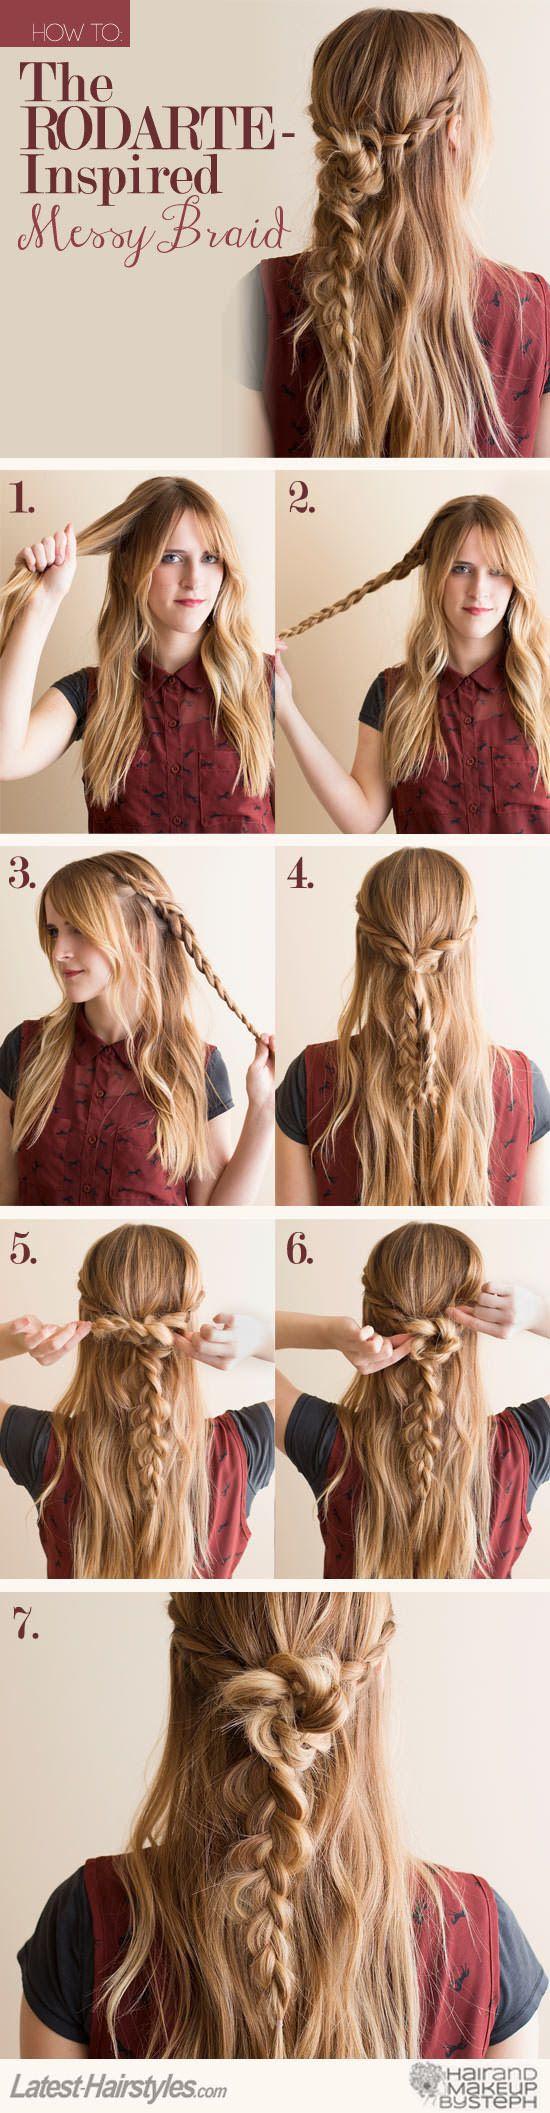 8 coiffure sirène